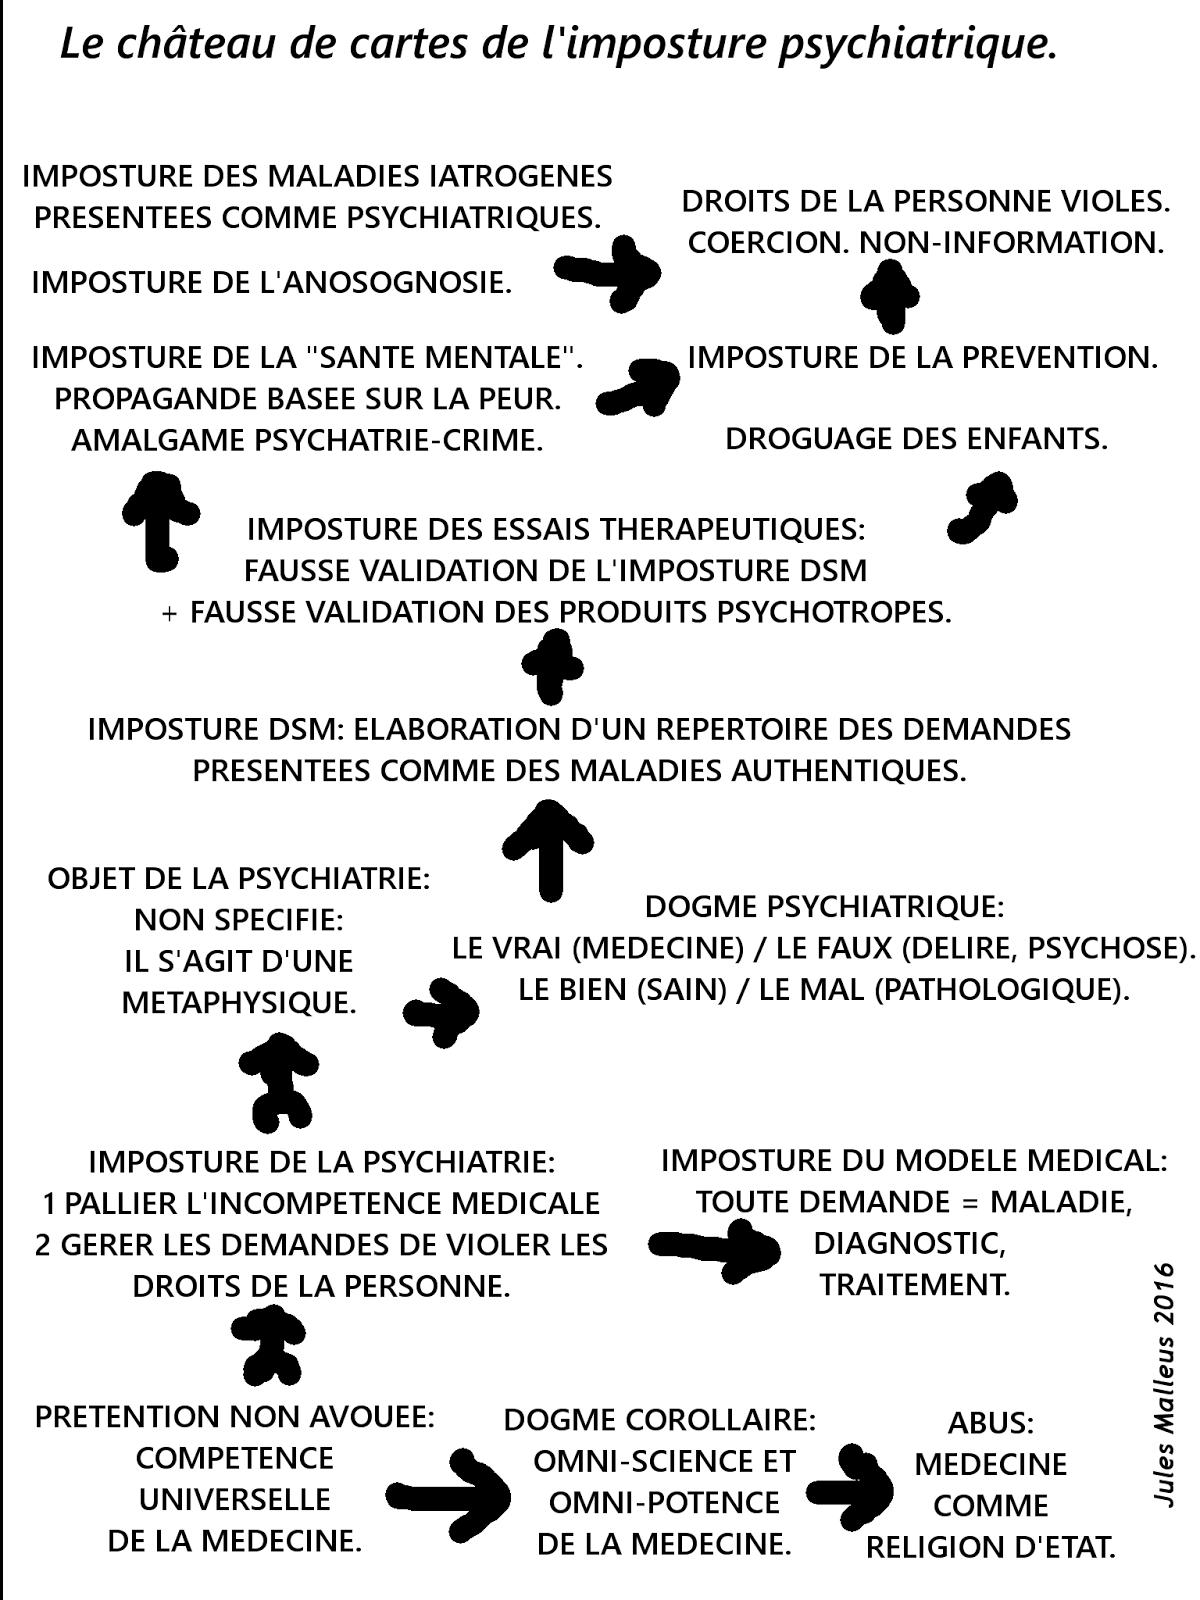 La psychiatrie est un bluff.